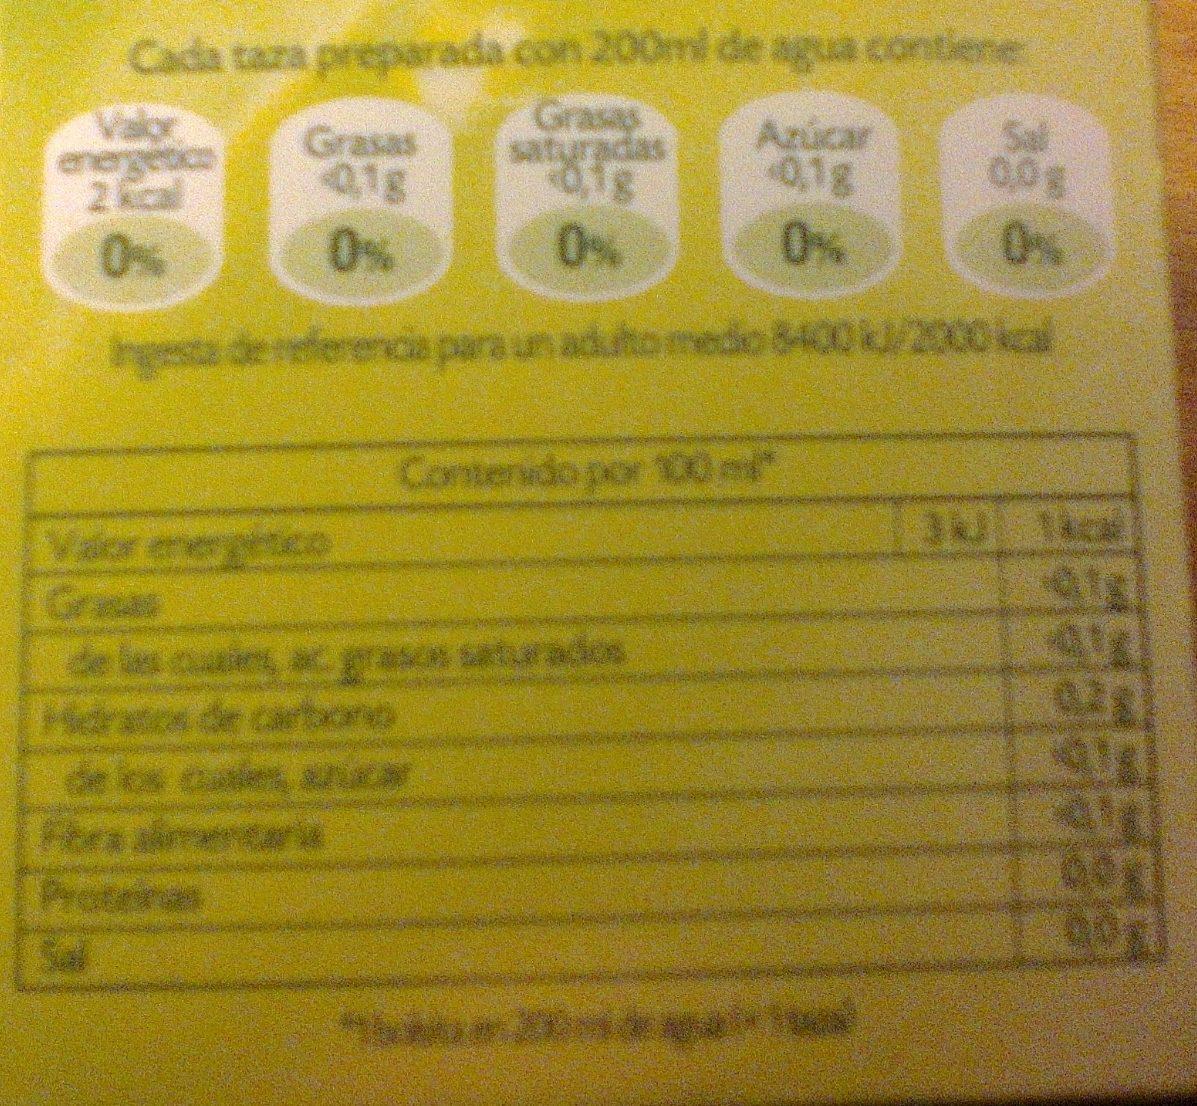 Té verde - Información nutricional